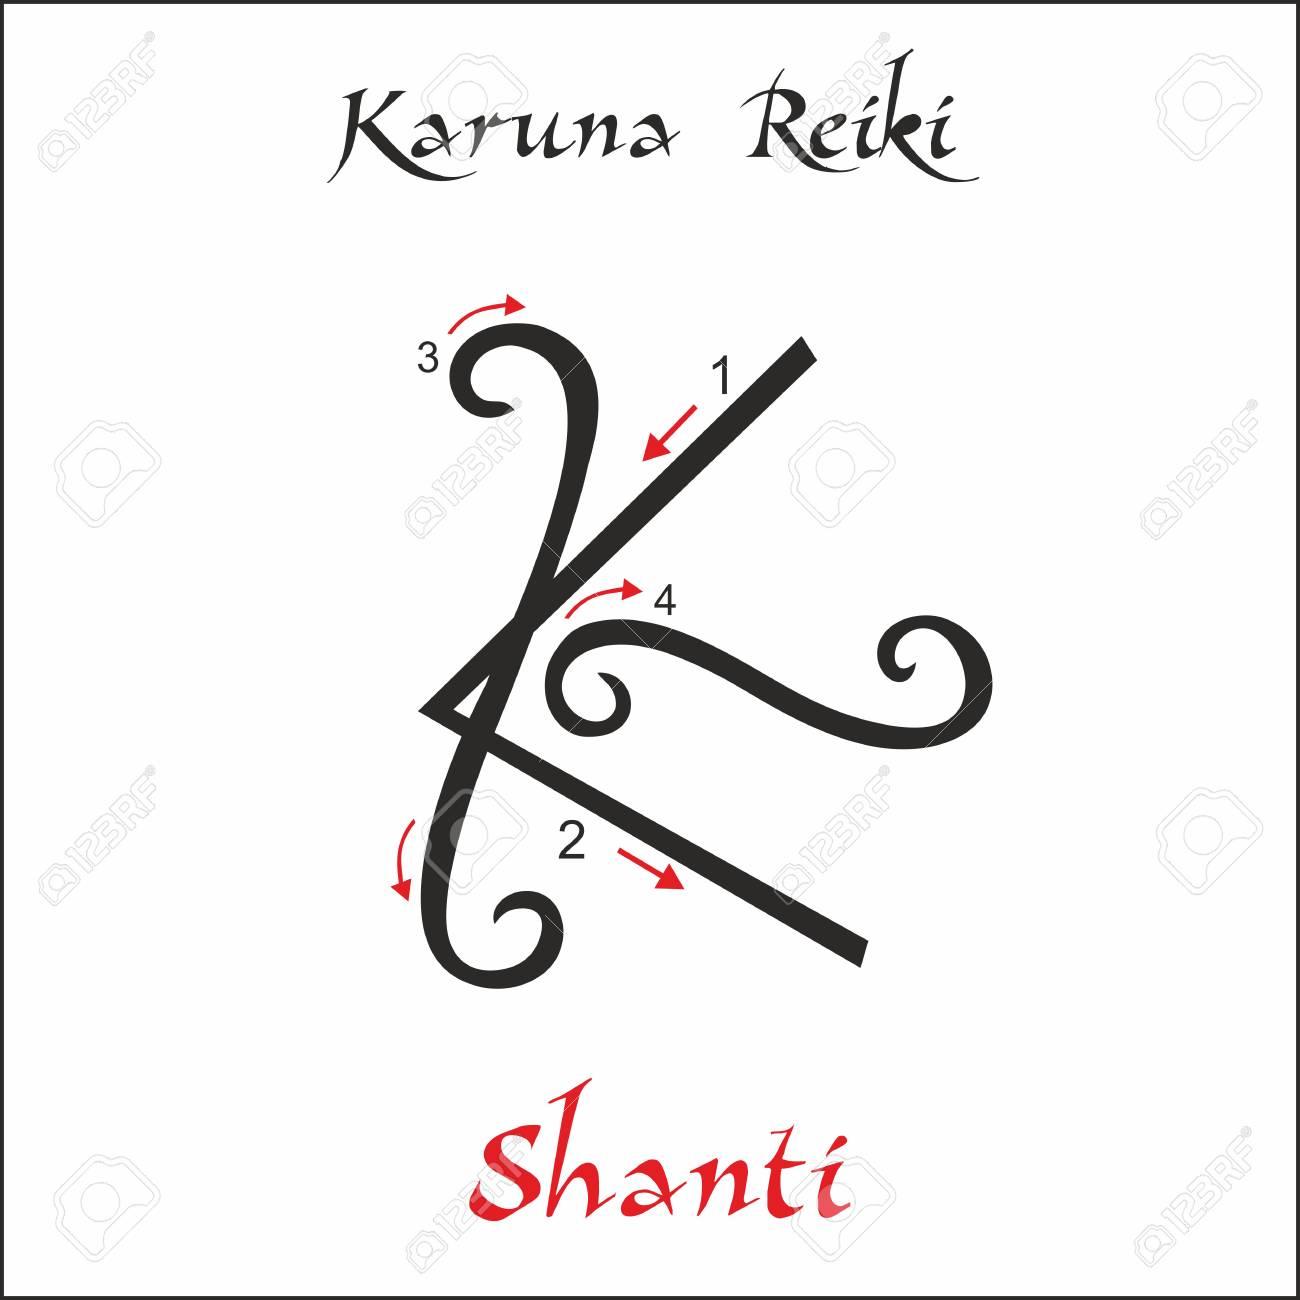 Karuna Reiki Energy Healing Alternative Medicine Shanti Symbol